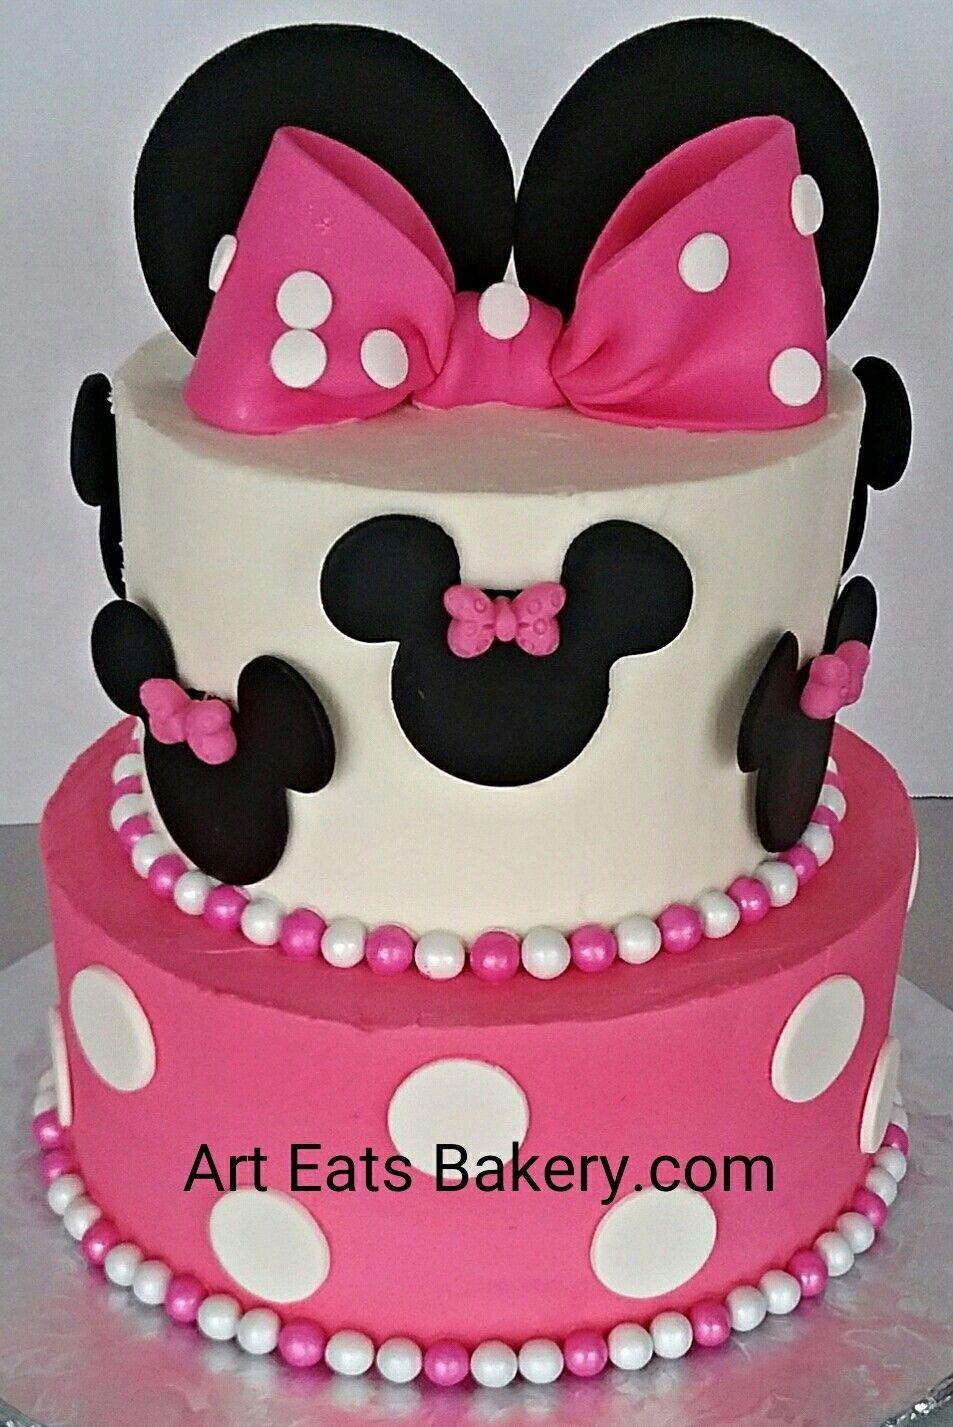 Awe Inspiring 25 Brilliant Image Of Minnie Birthday Cake Minnie Mouse Personalised Birthday Cards Paralily Jamesorg